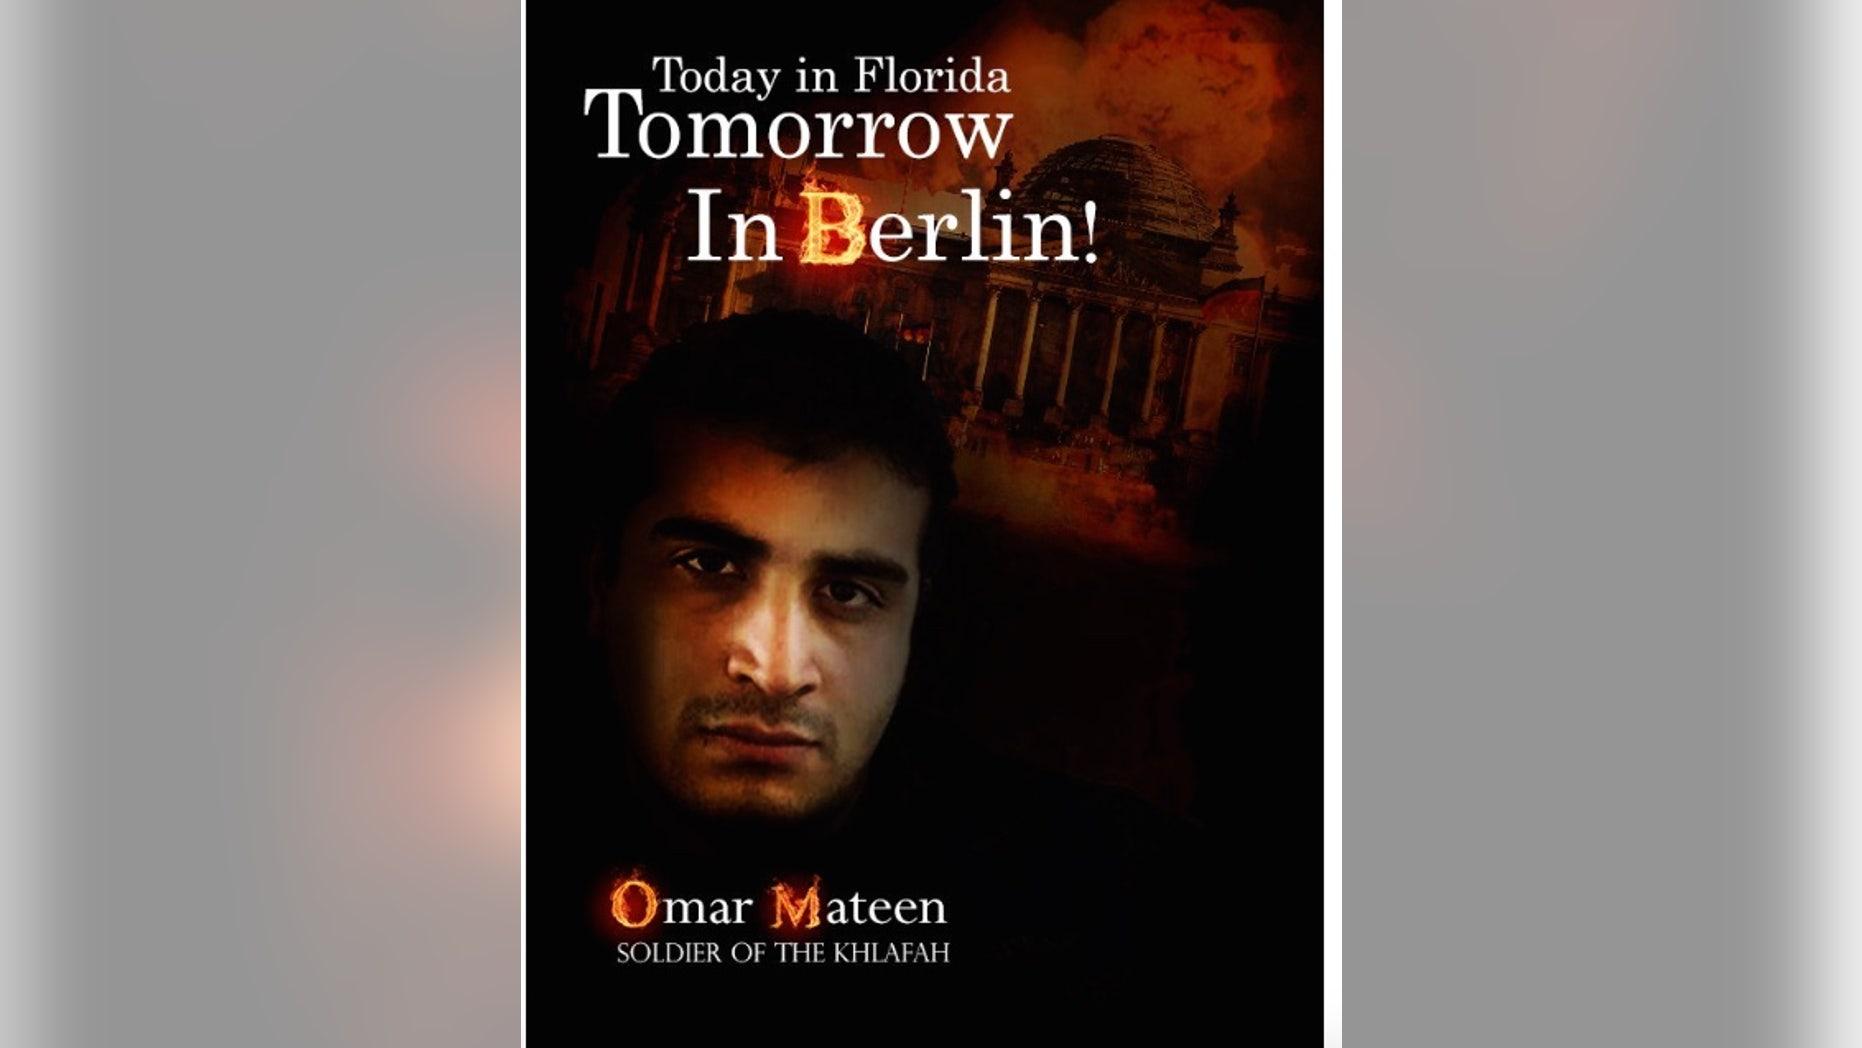 A pro-ISIS piece of propaganda celebrating Omar Mateen's terror attack.